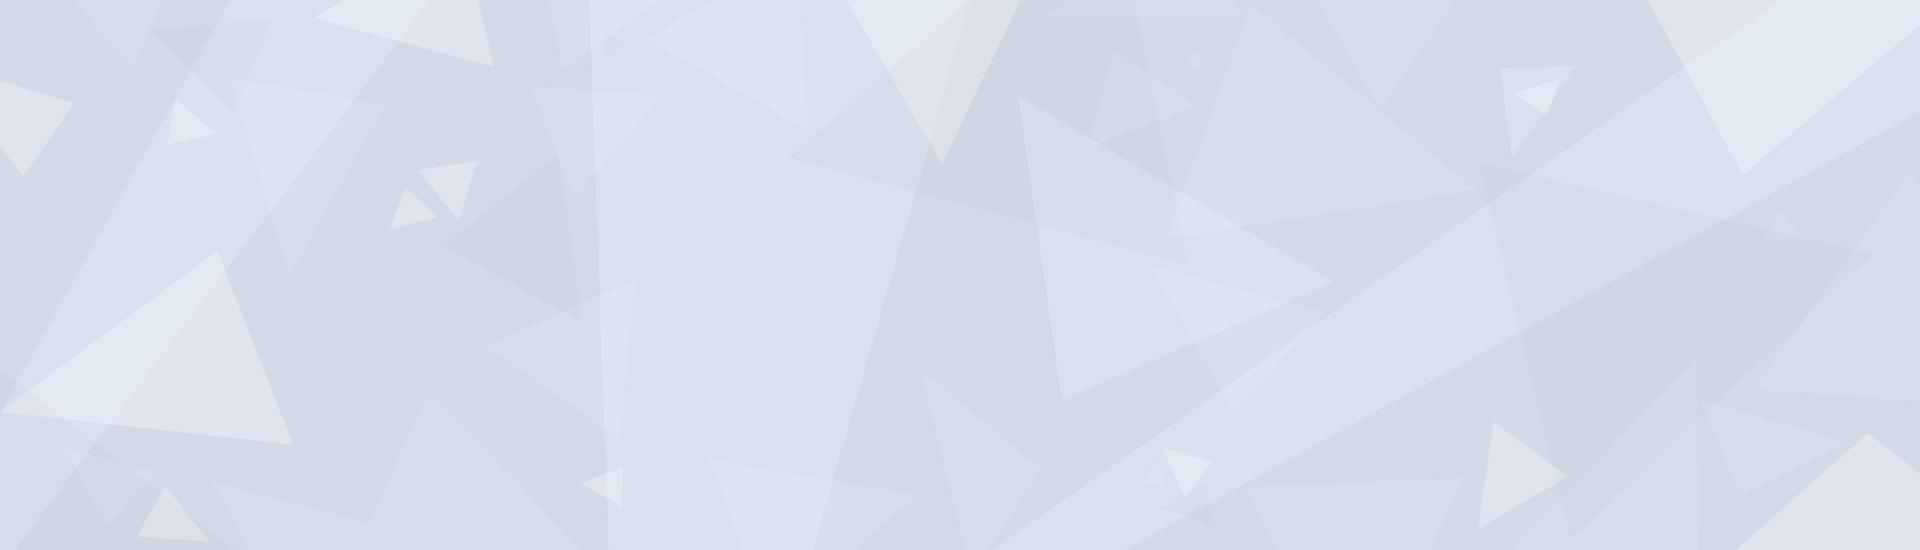 Wshalors - VSLeague Online eSport